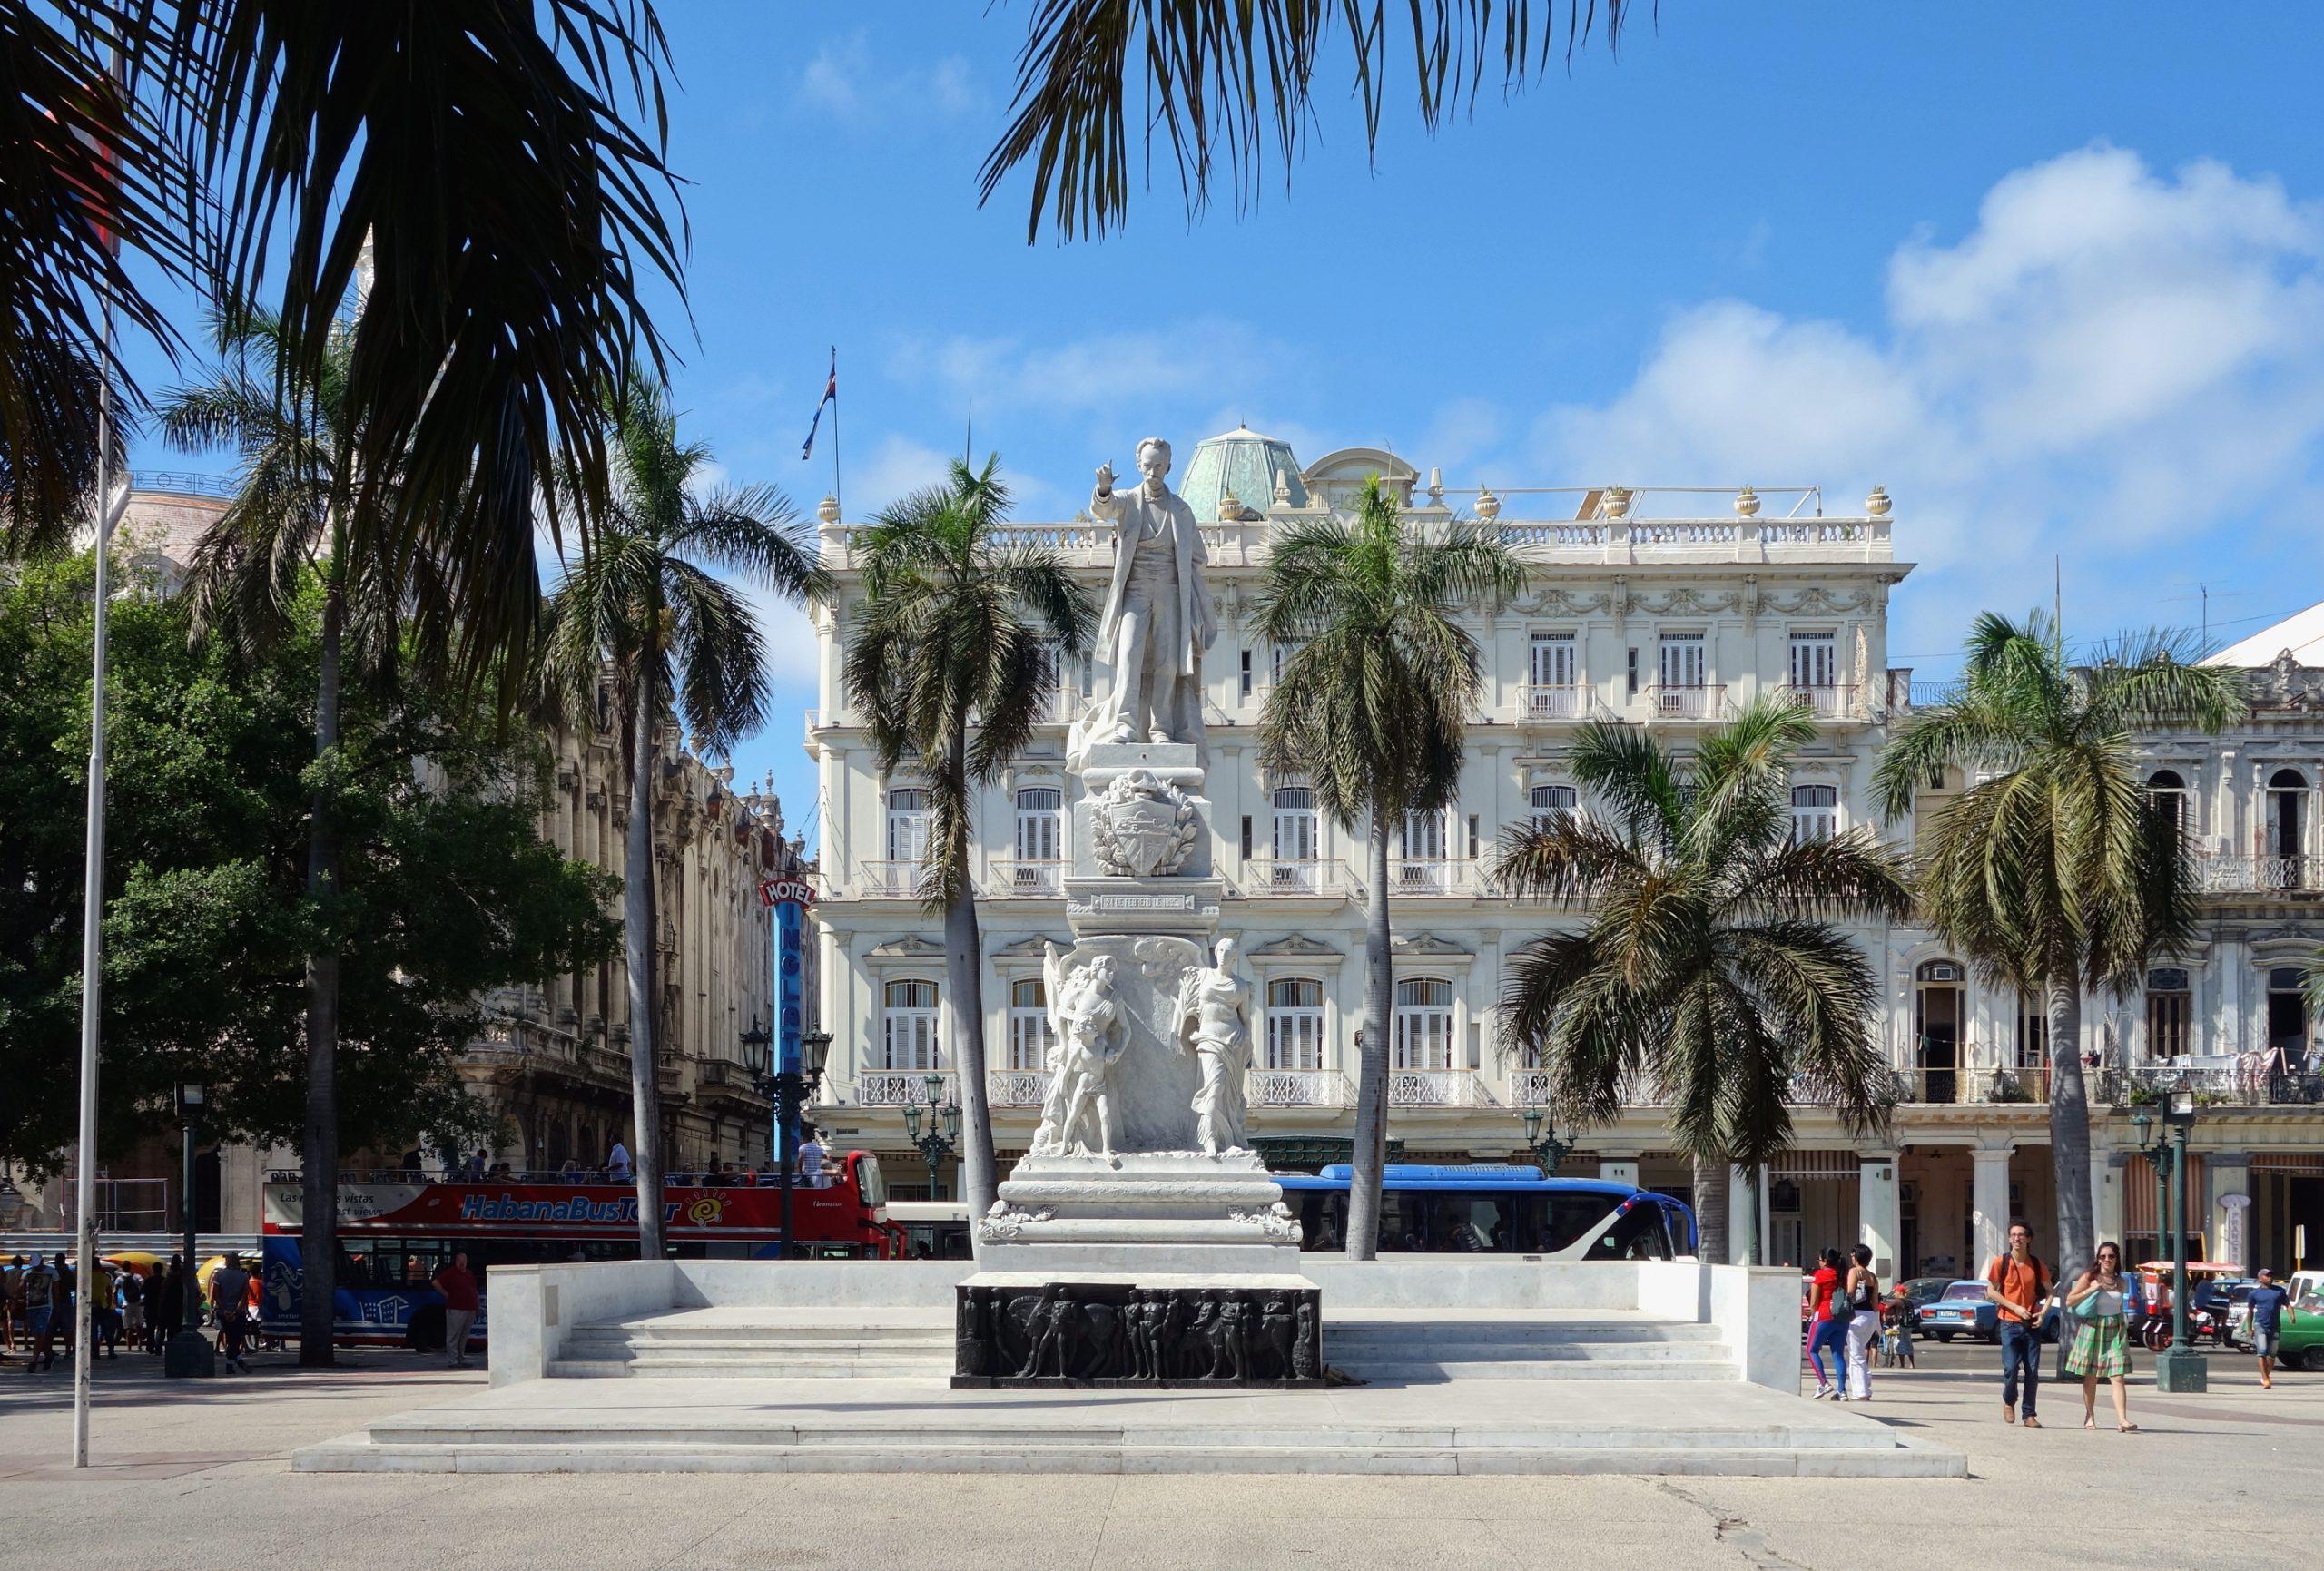 Parque Central de La Habana Monumento a Marti scaled